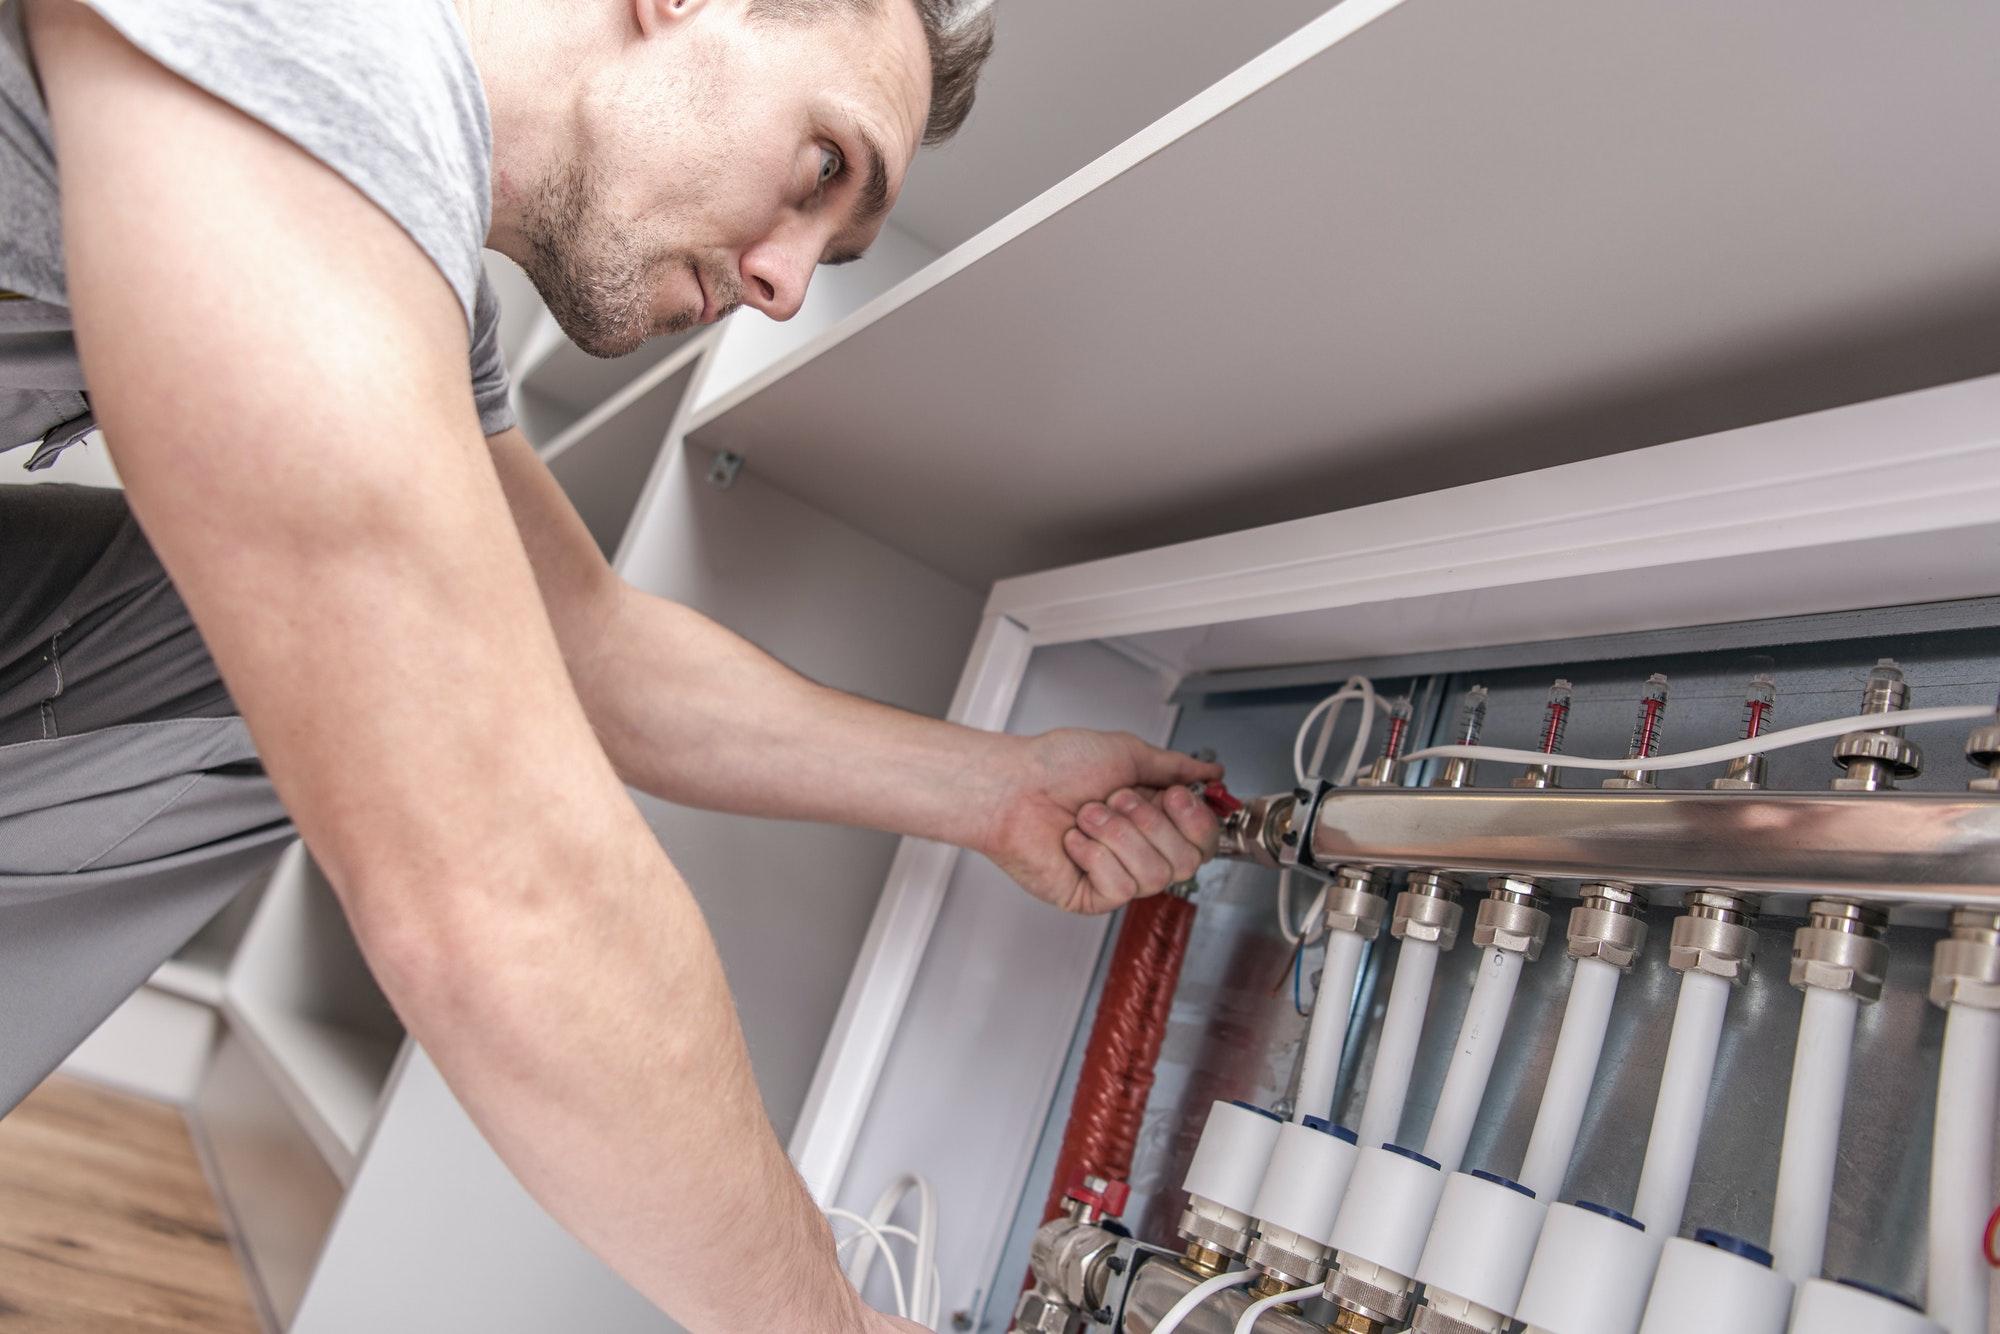 Men Adjusting Apartment Heat on the Central System Valves